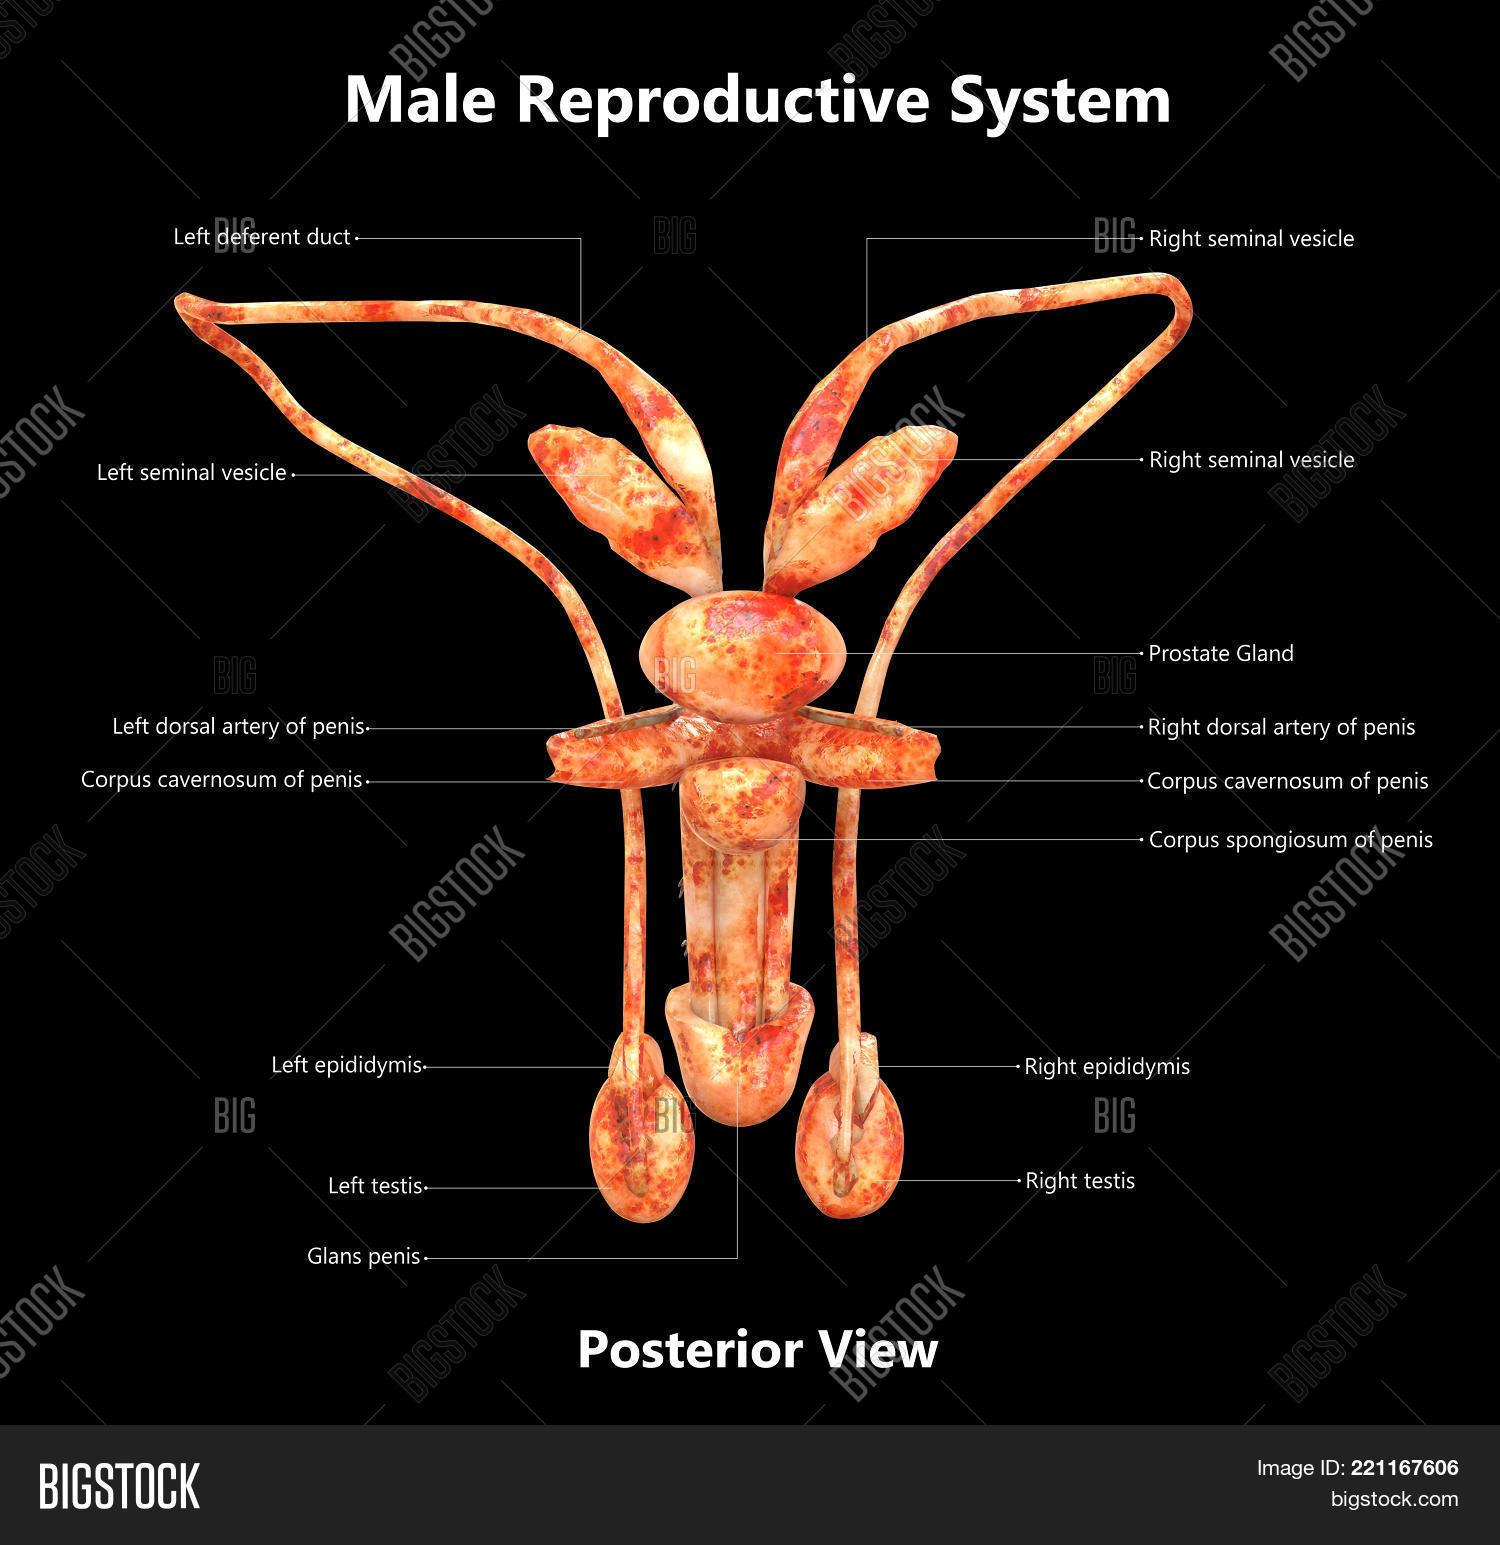 3d Illustration Male Image Photo Free Trial Bigstock